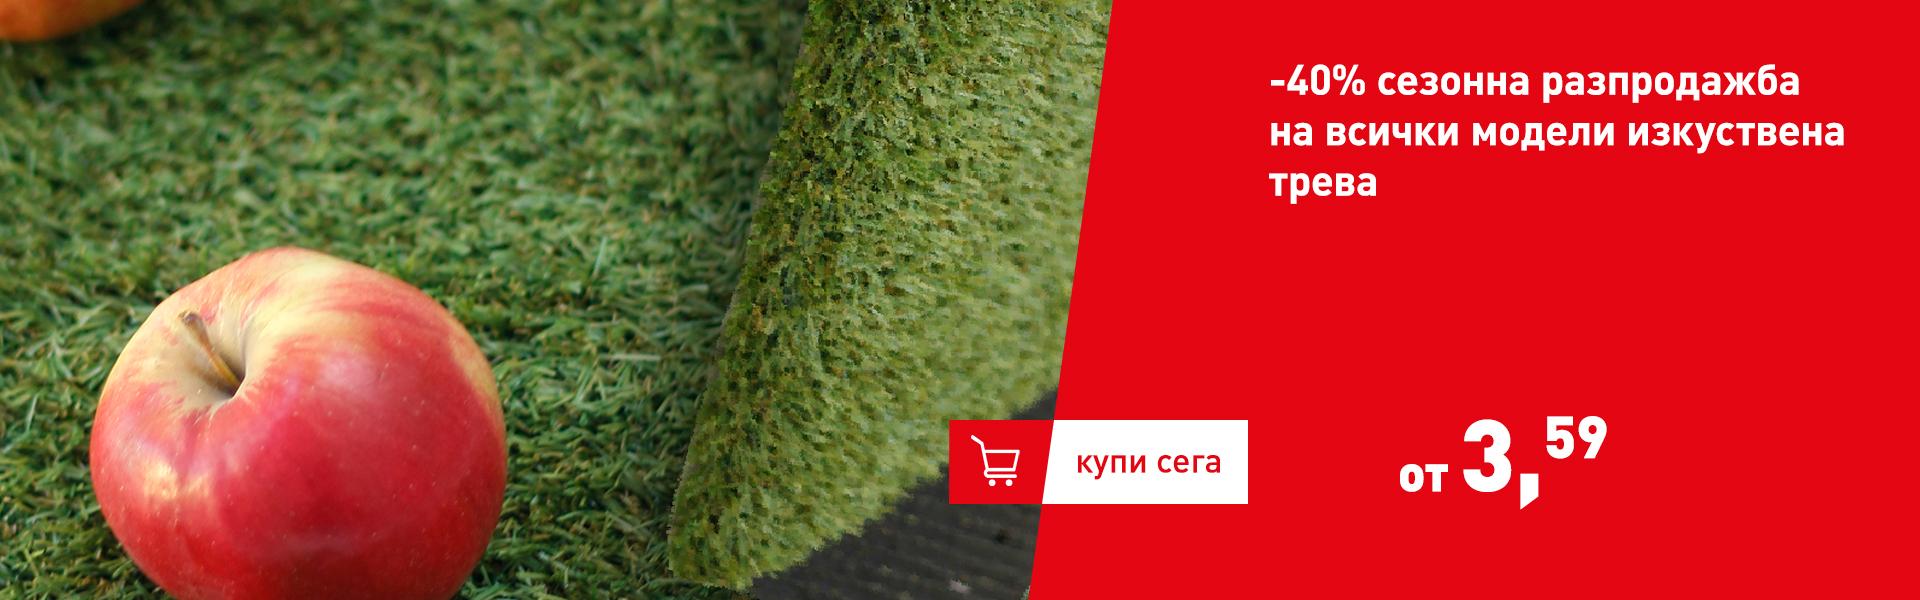 Разпродажба на изкуствена трева